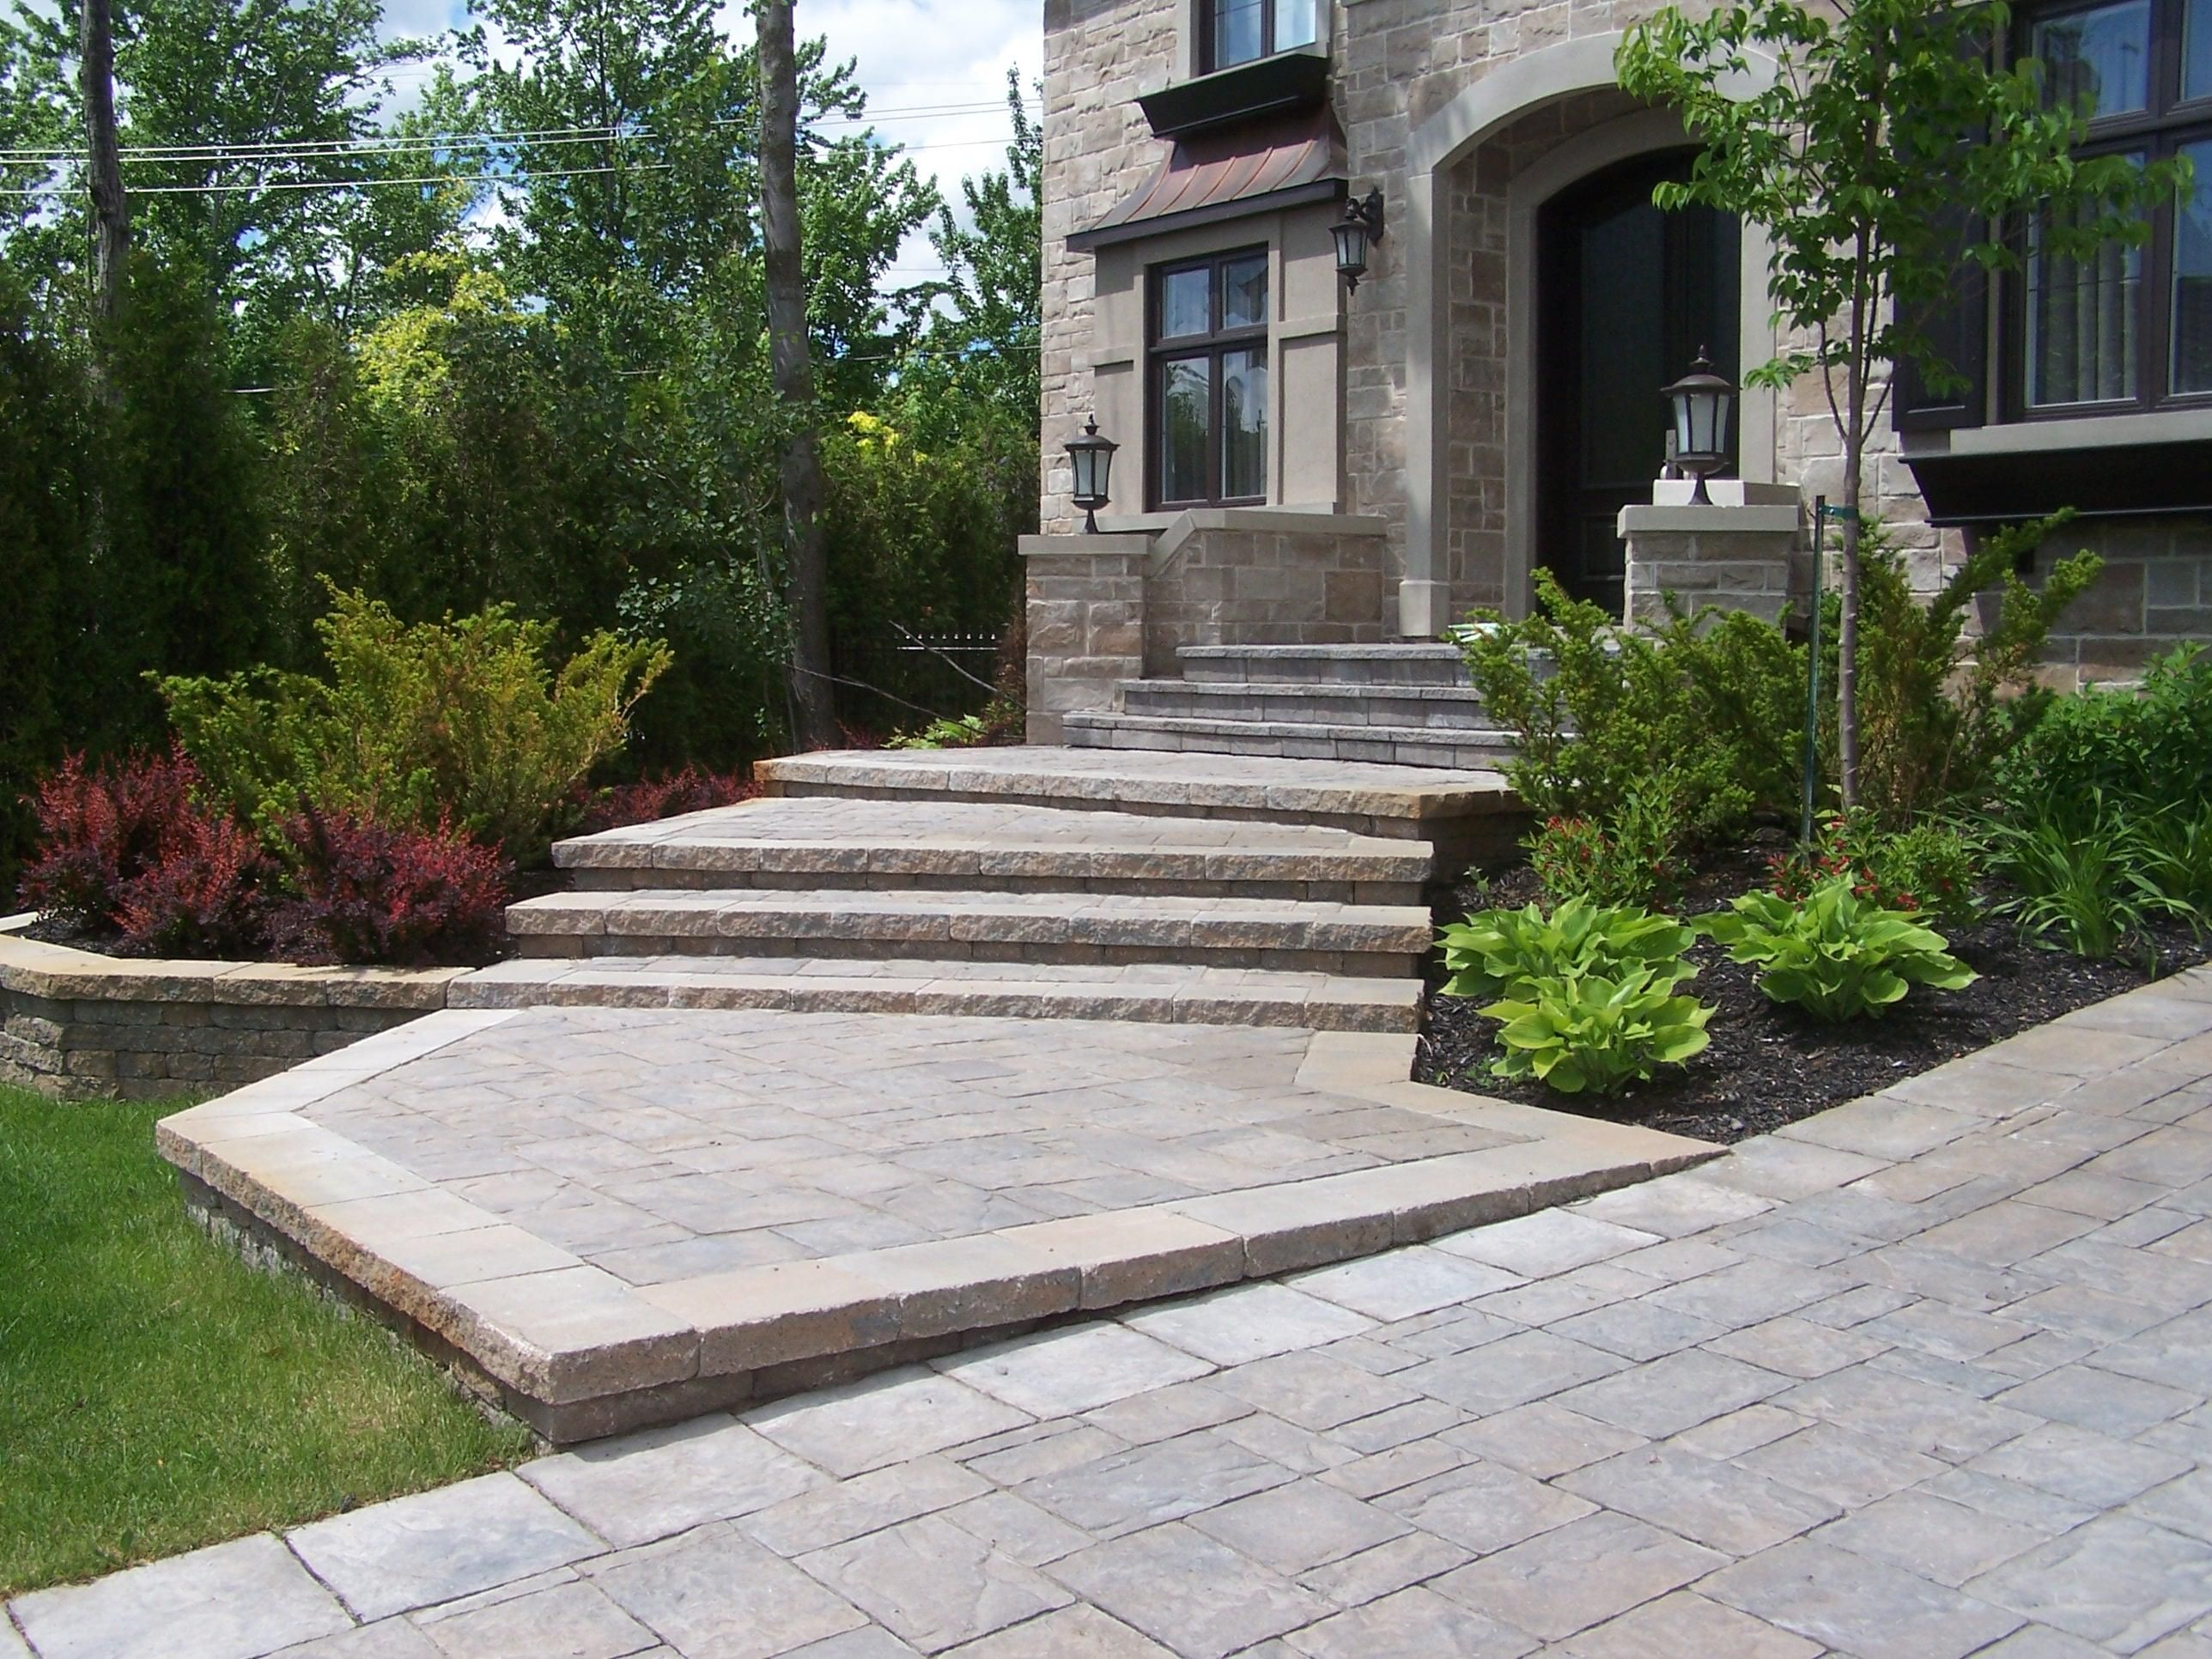 entr e marches et muret en pav uni am nagement paysager pinterest concrete front steps. Black Bedroom Furniture Sets. Home Design Ideas